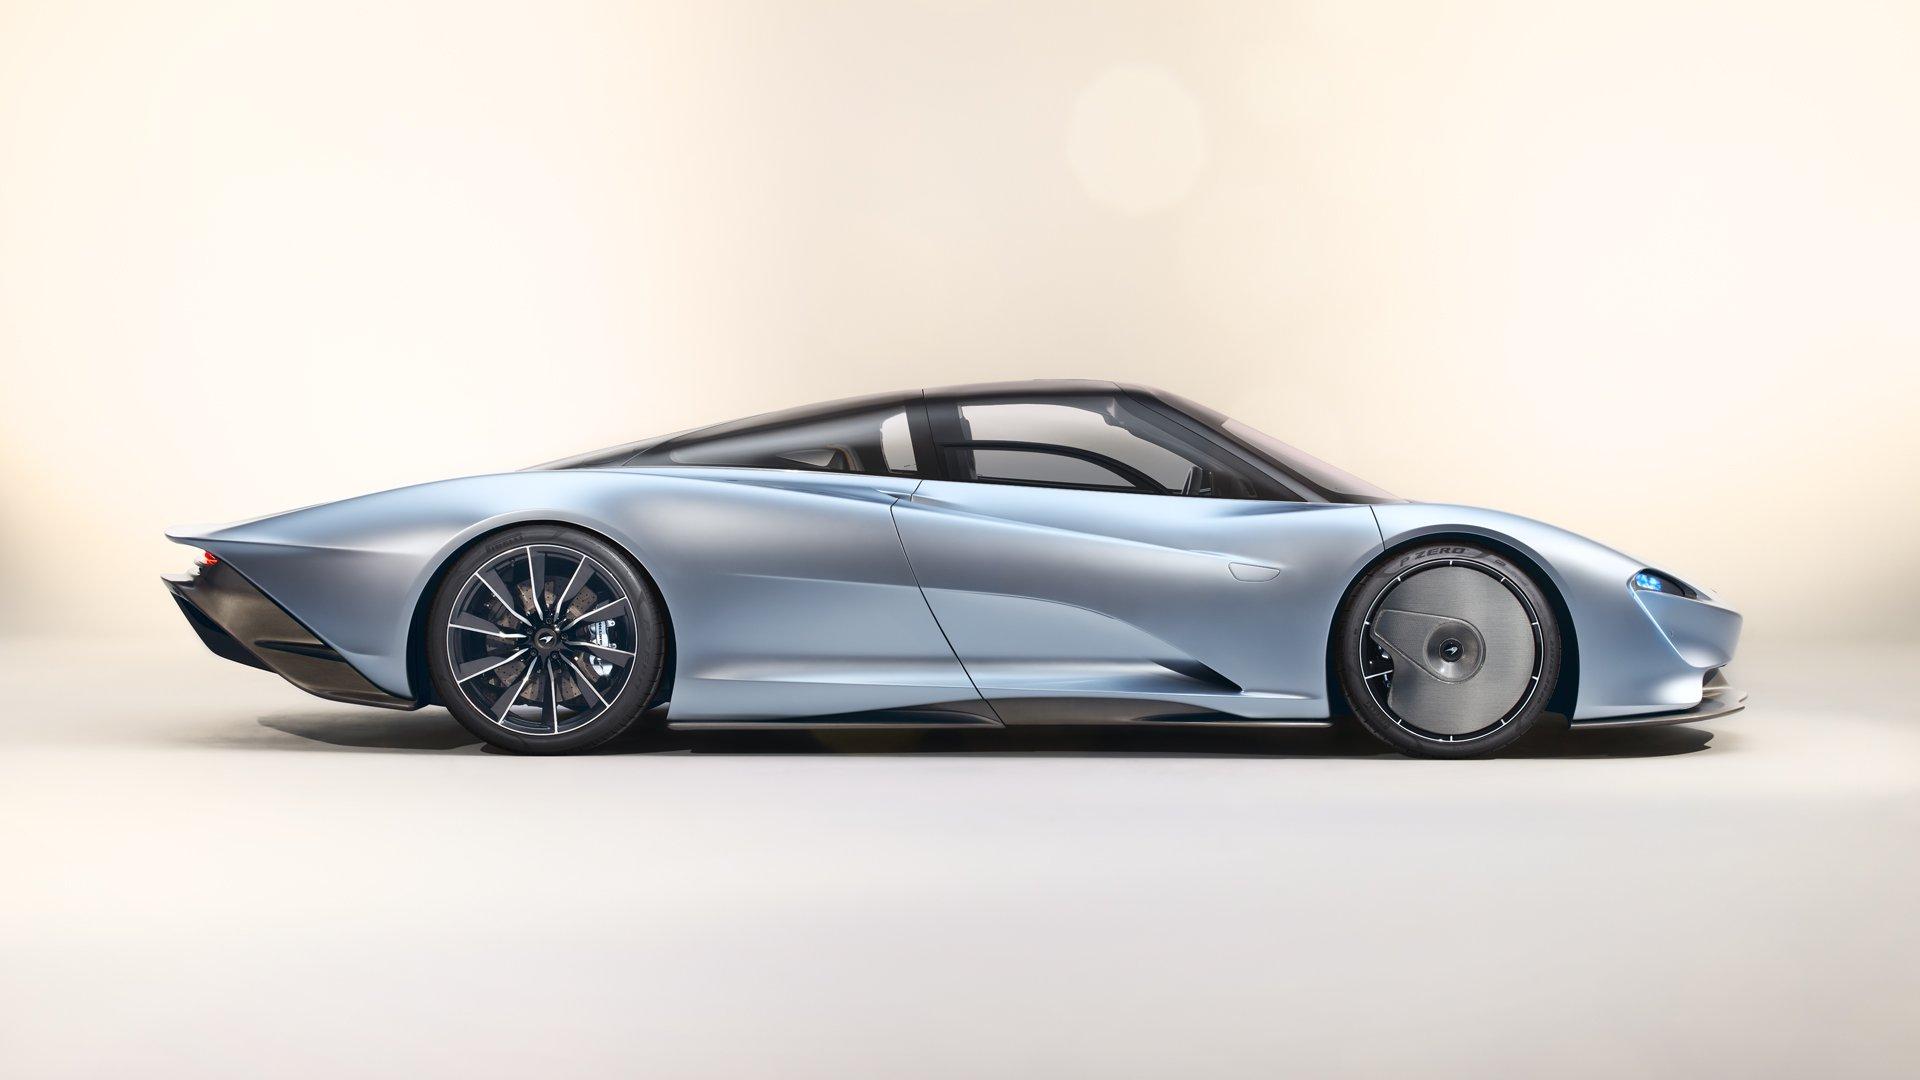 Diamond Collective McLaren speedtail blog post image six